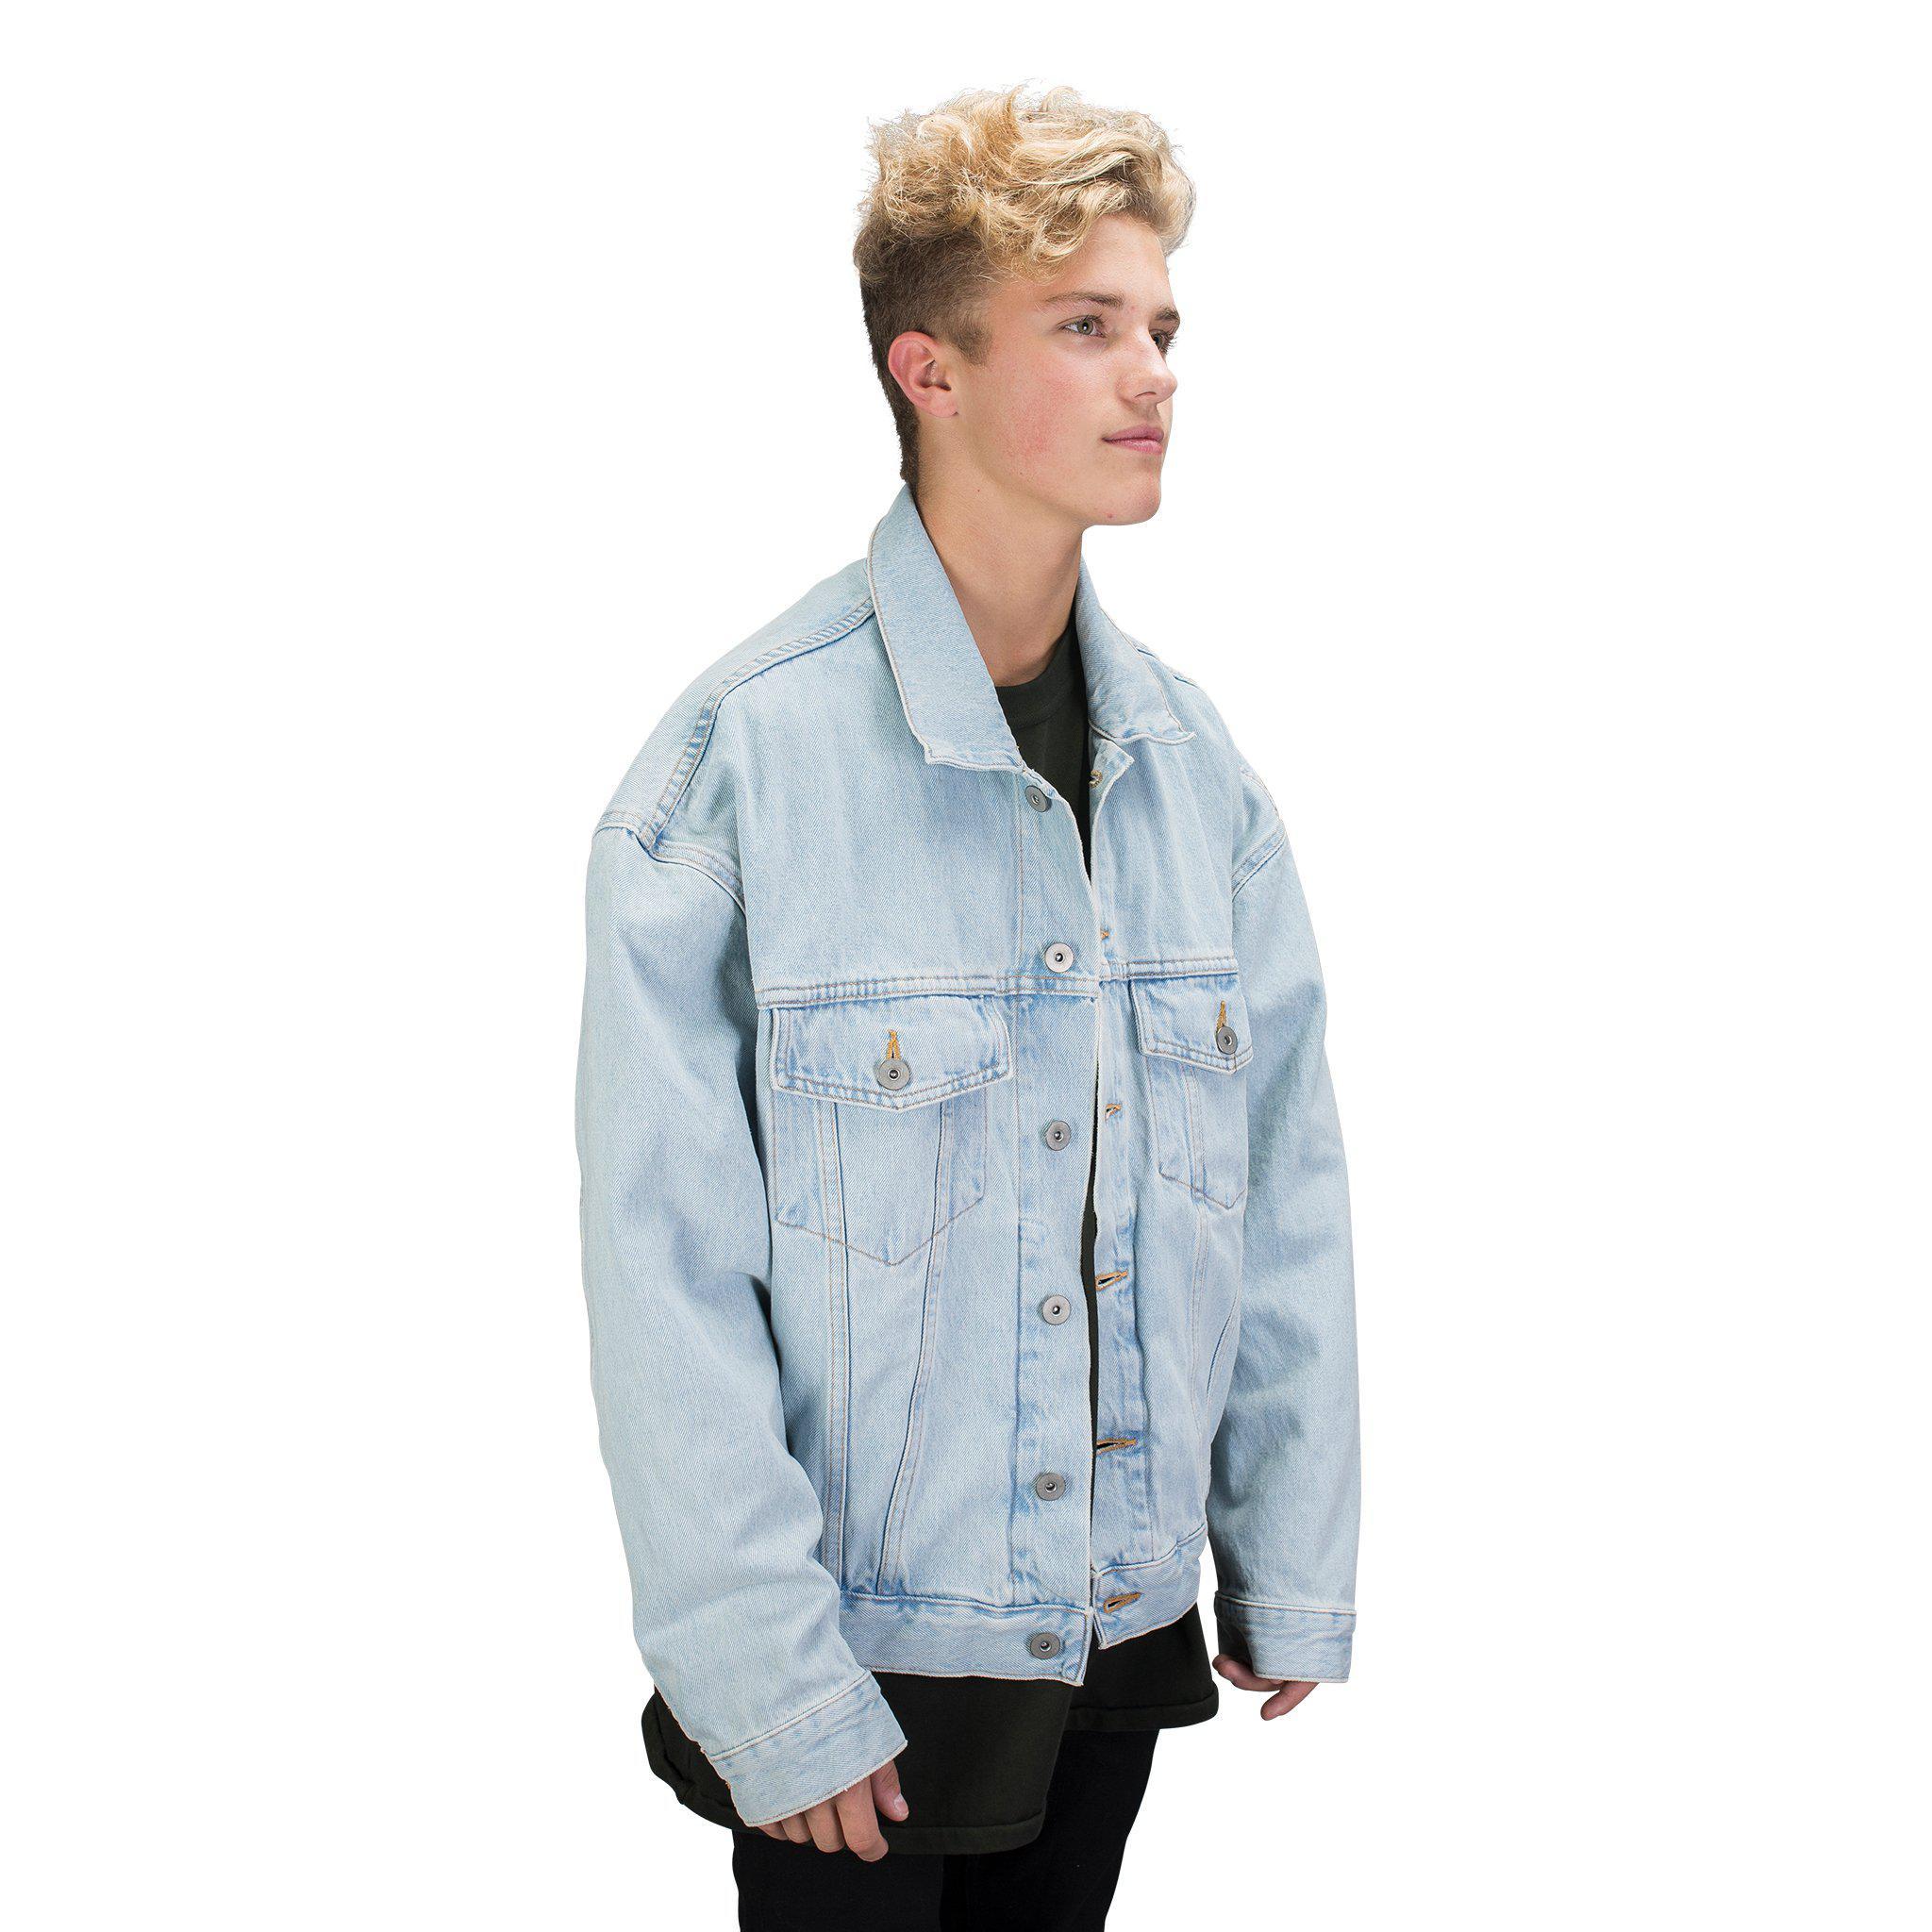 a84705455c5 Lyst - Yeezy Classic Jean Jacket in Blue for Men